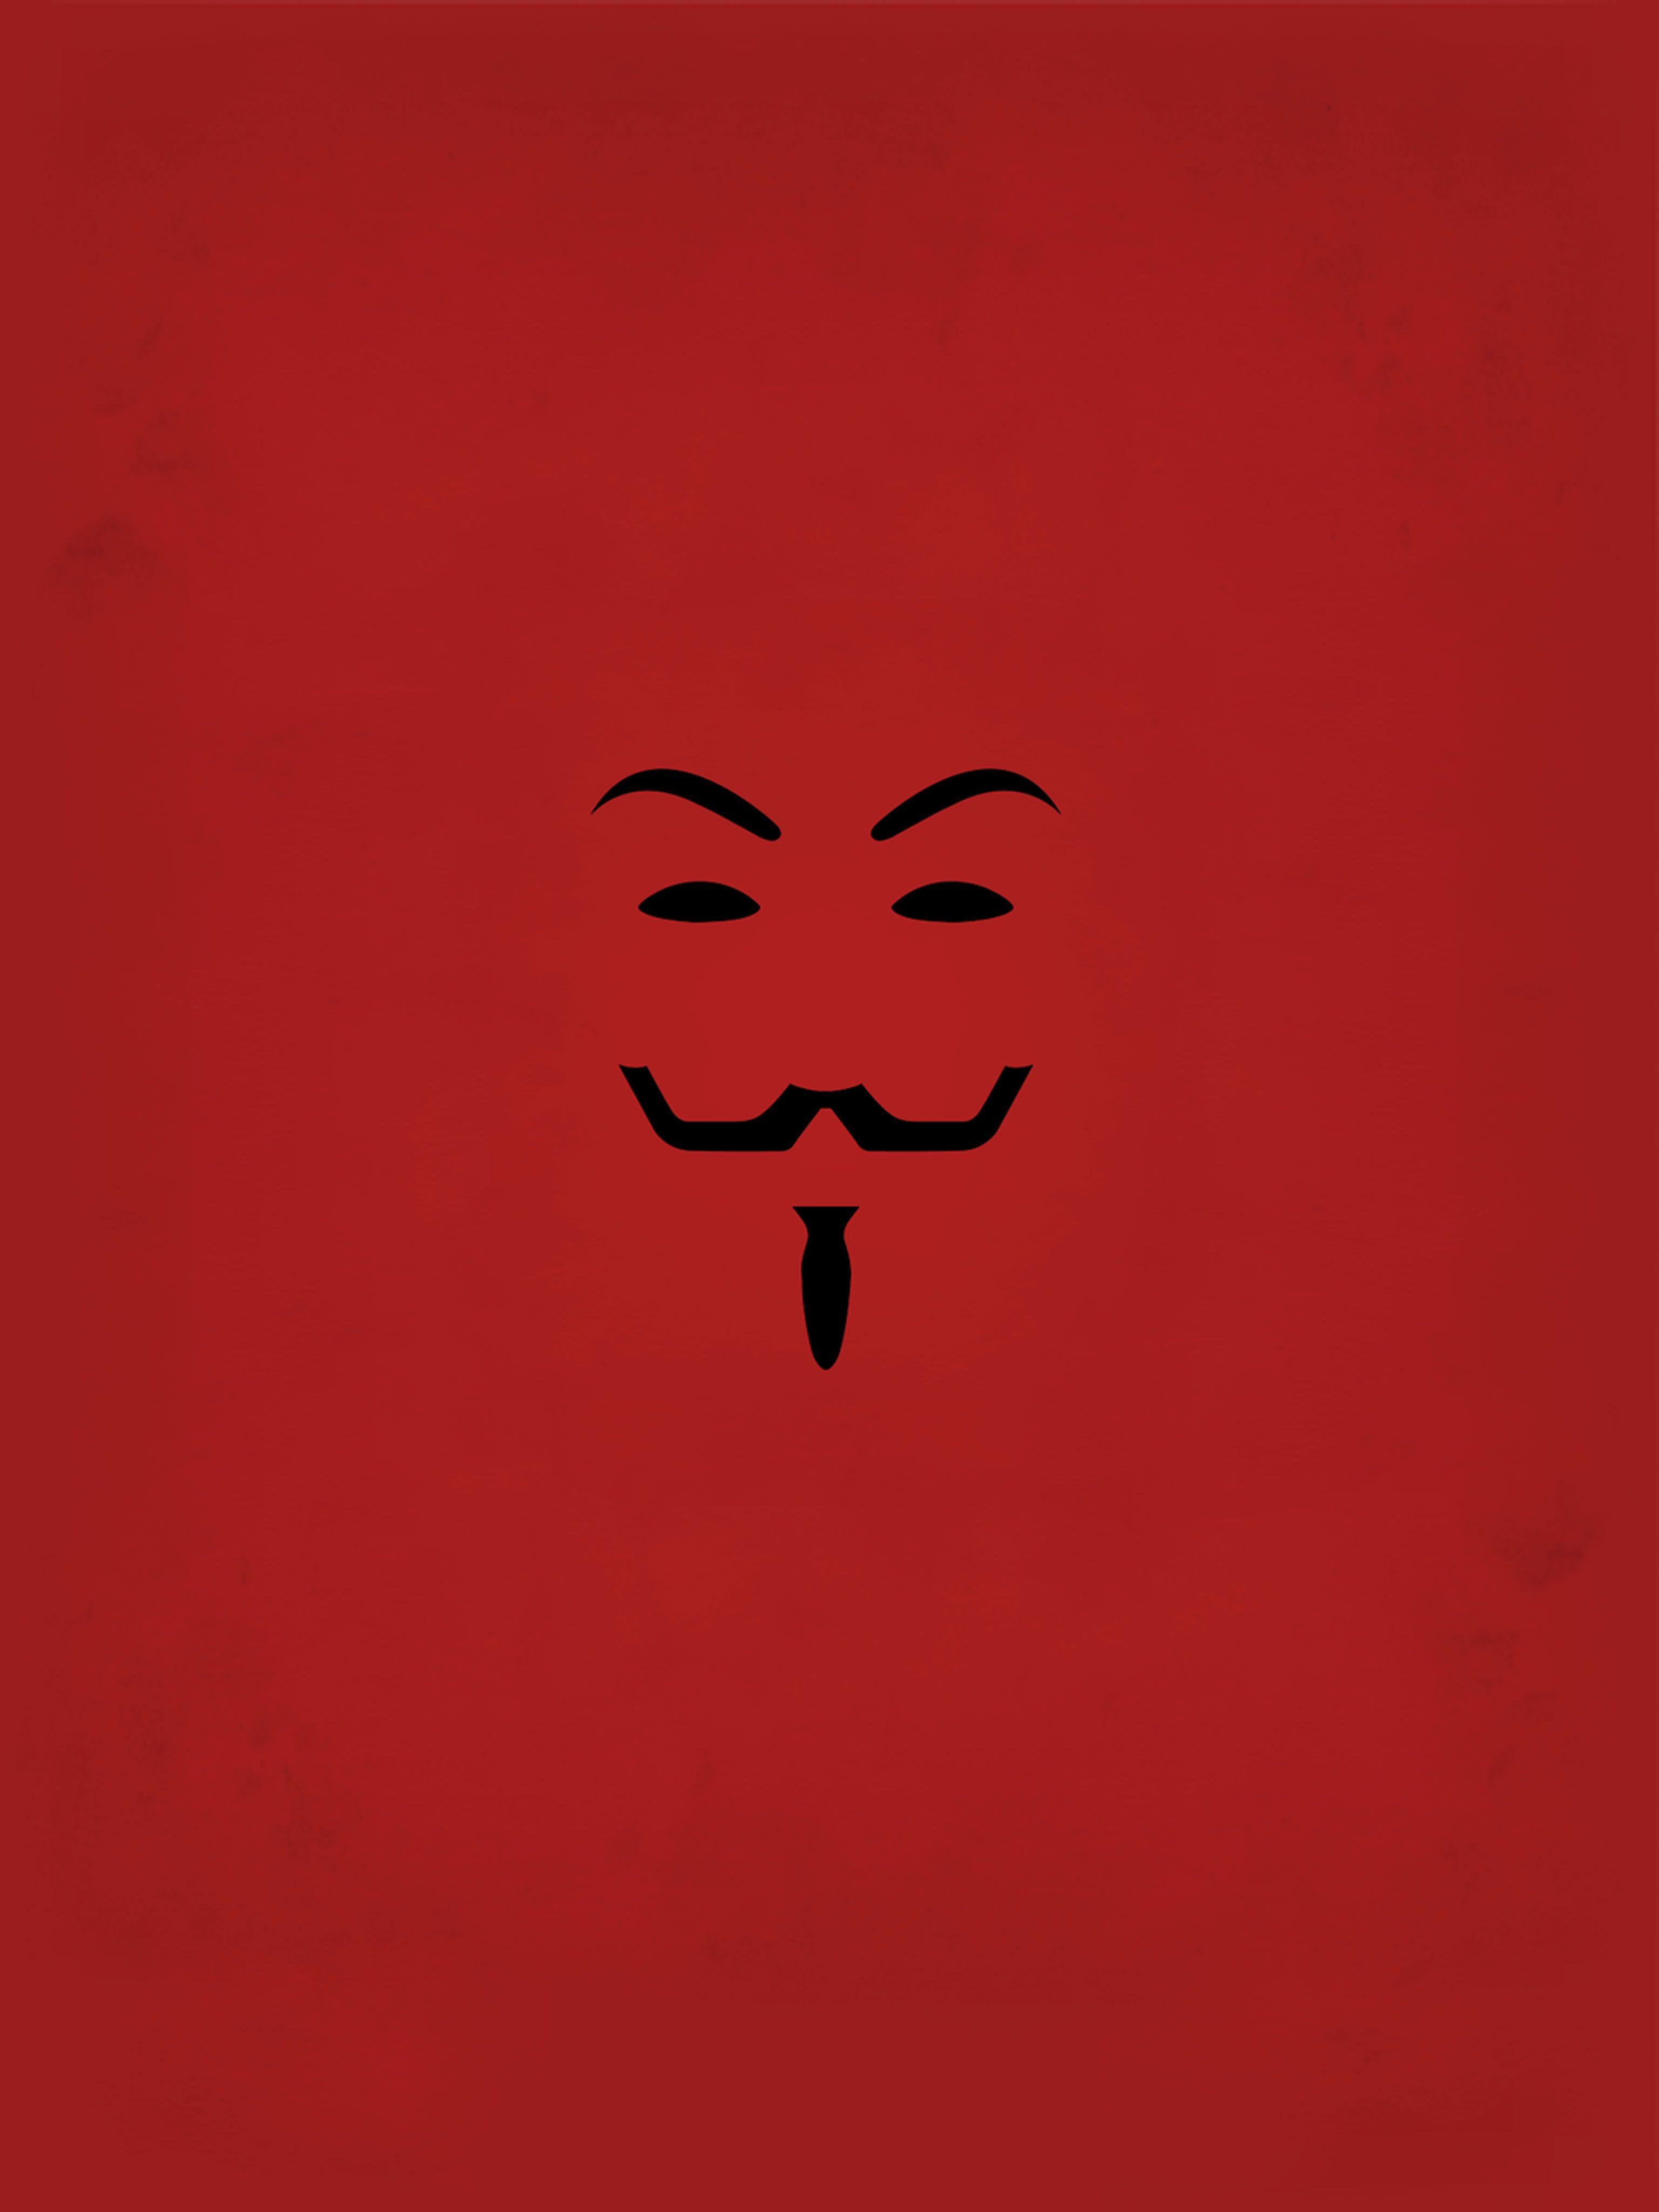 Pc Vendetta Mask Wallpapers Makar Mityushin